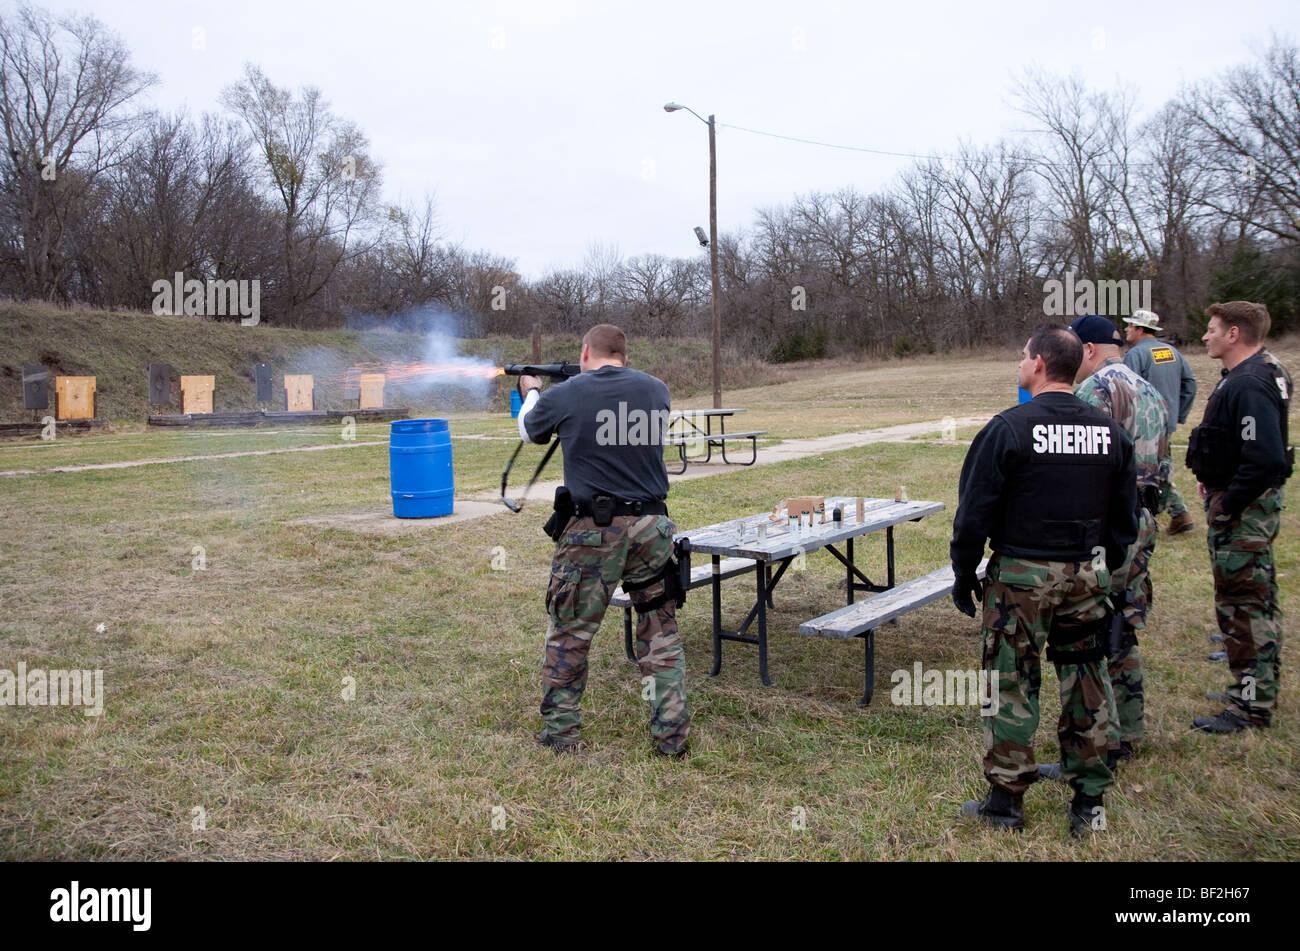 Deputy sheriffs using gas munitions on shooting range. - Stock Image